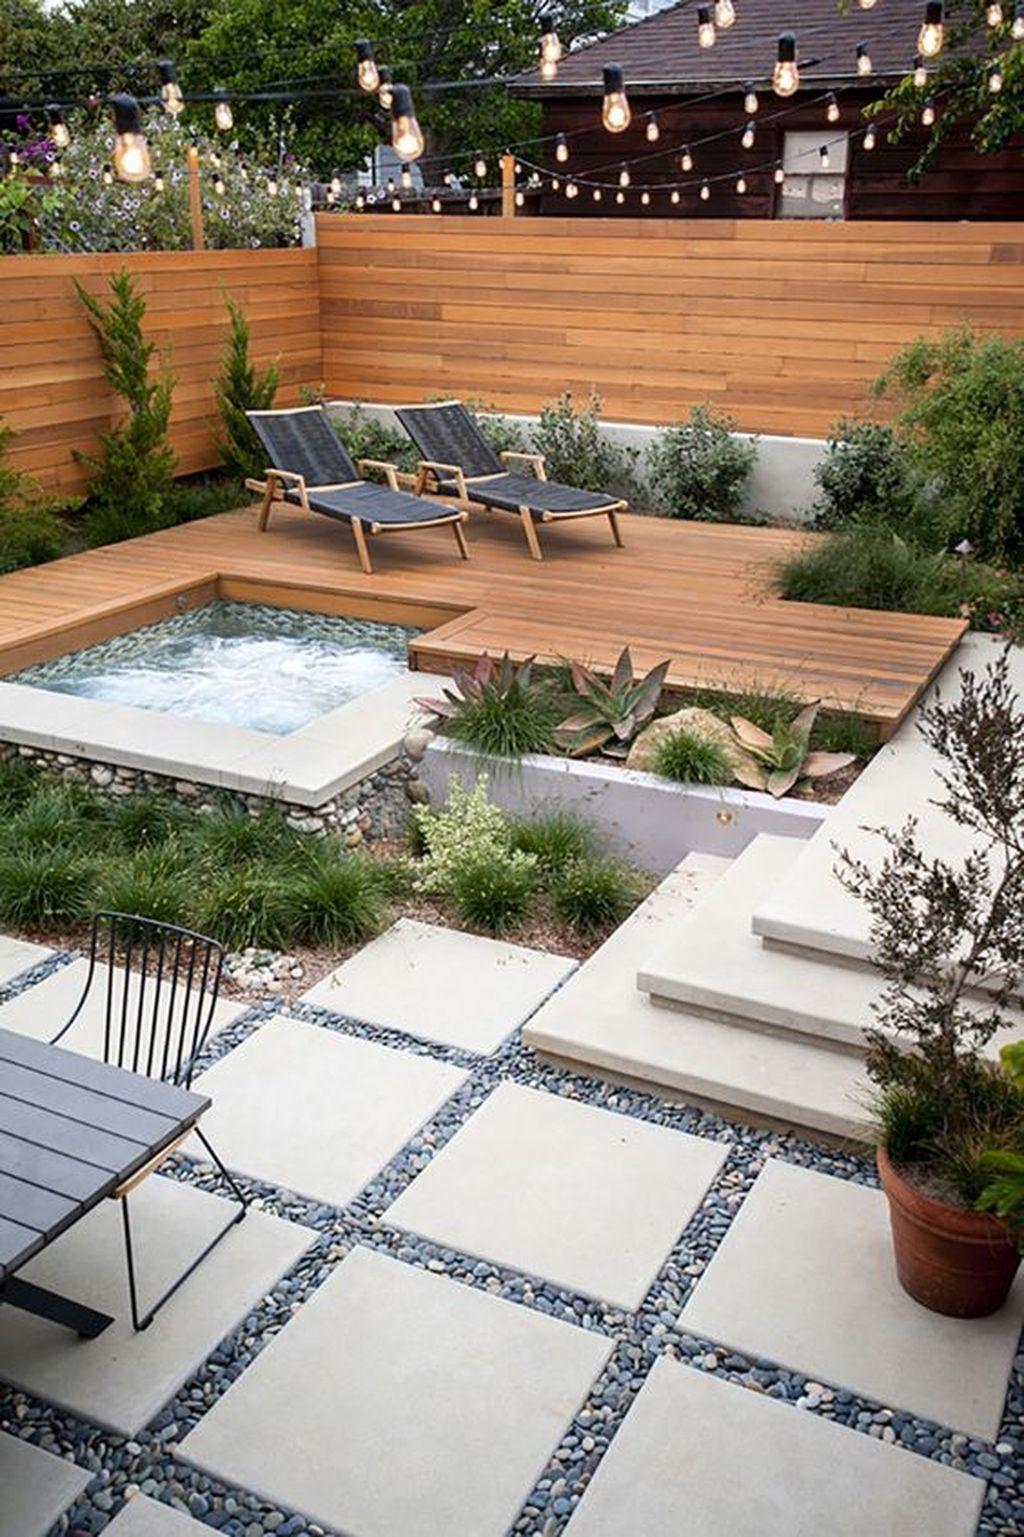 Awesome Backyard Landscaping Ideas Low Maintenance 03 Small